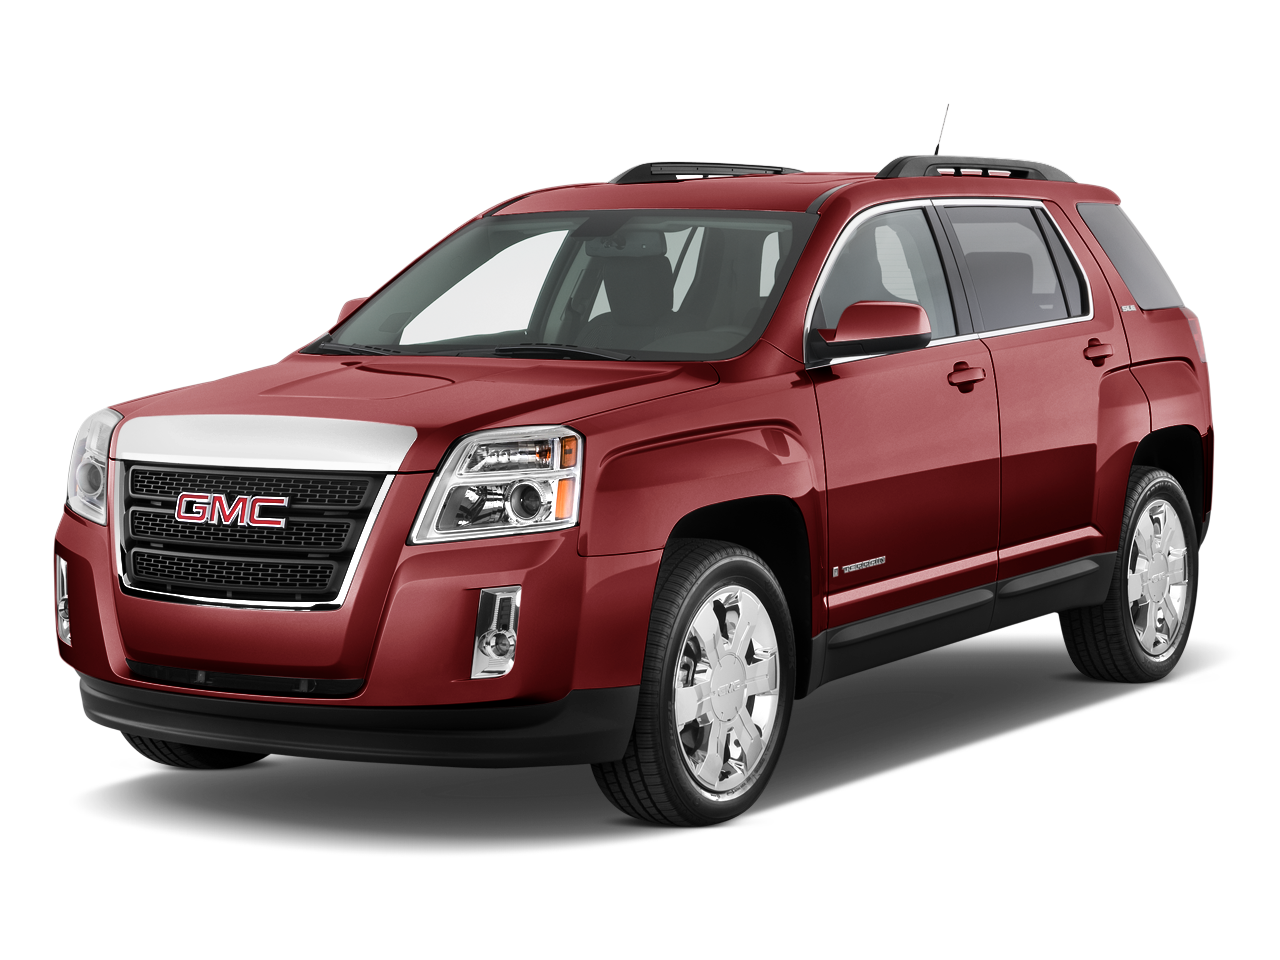 Used 2014 Gmc Terrain Sle 1 Near Shawnee Ok Joe Cooper Chevrolet Cadillac